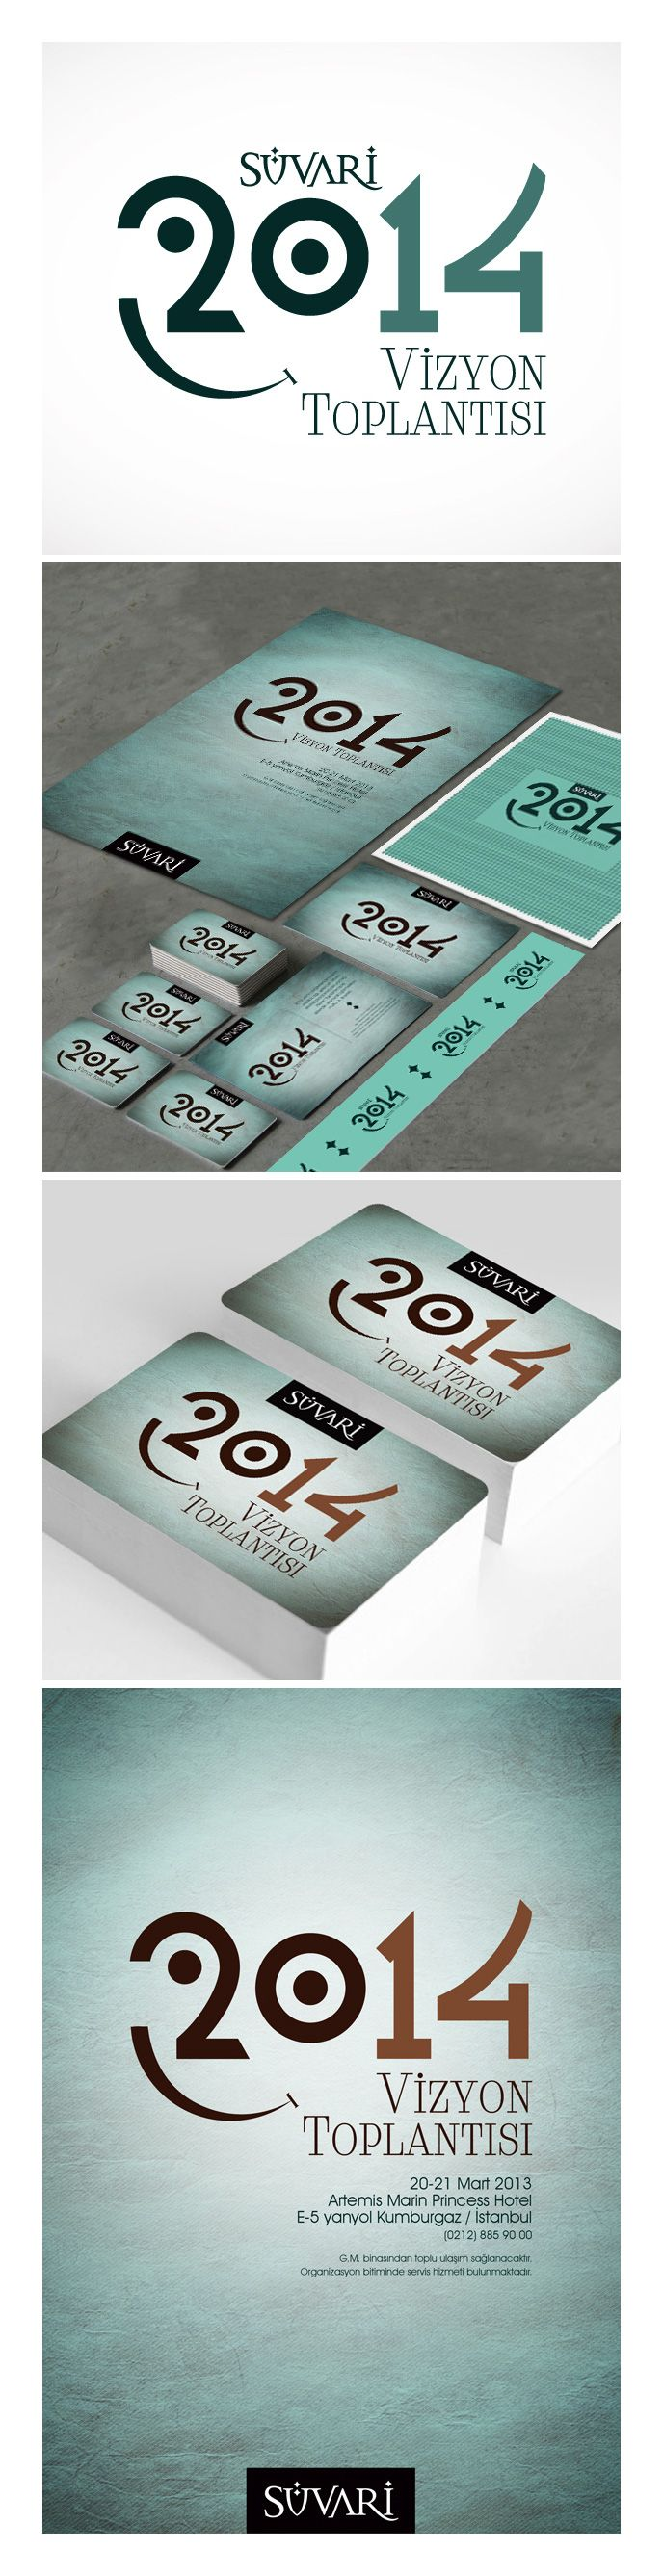 Süvari / Vision meeting designs